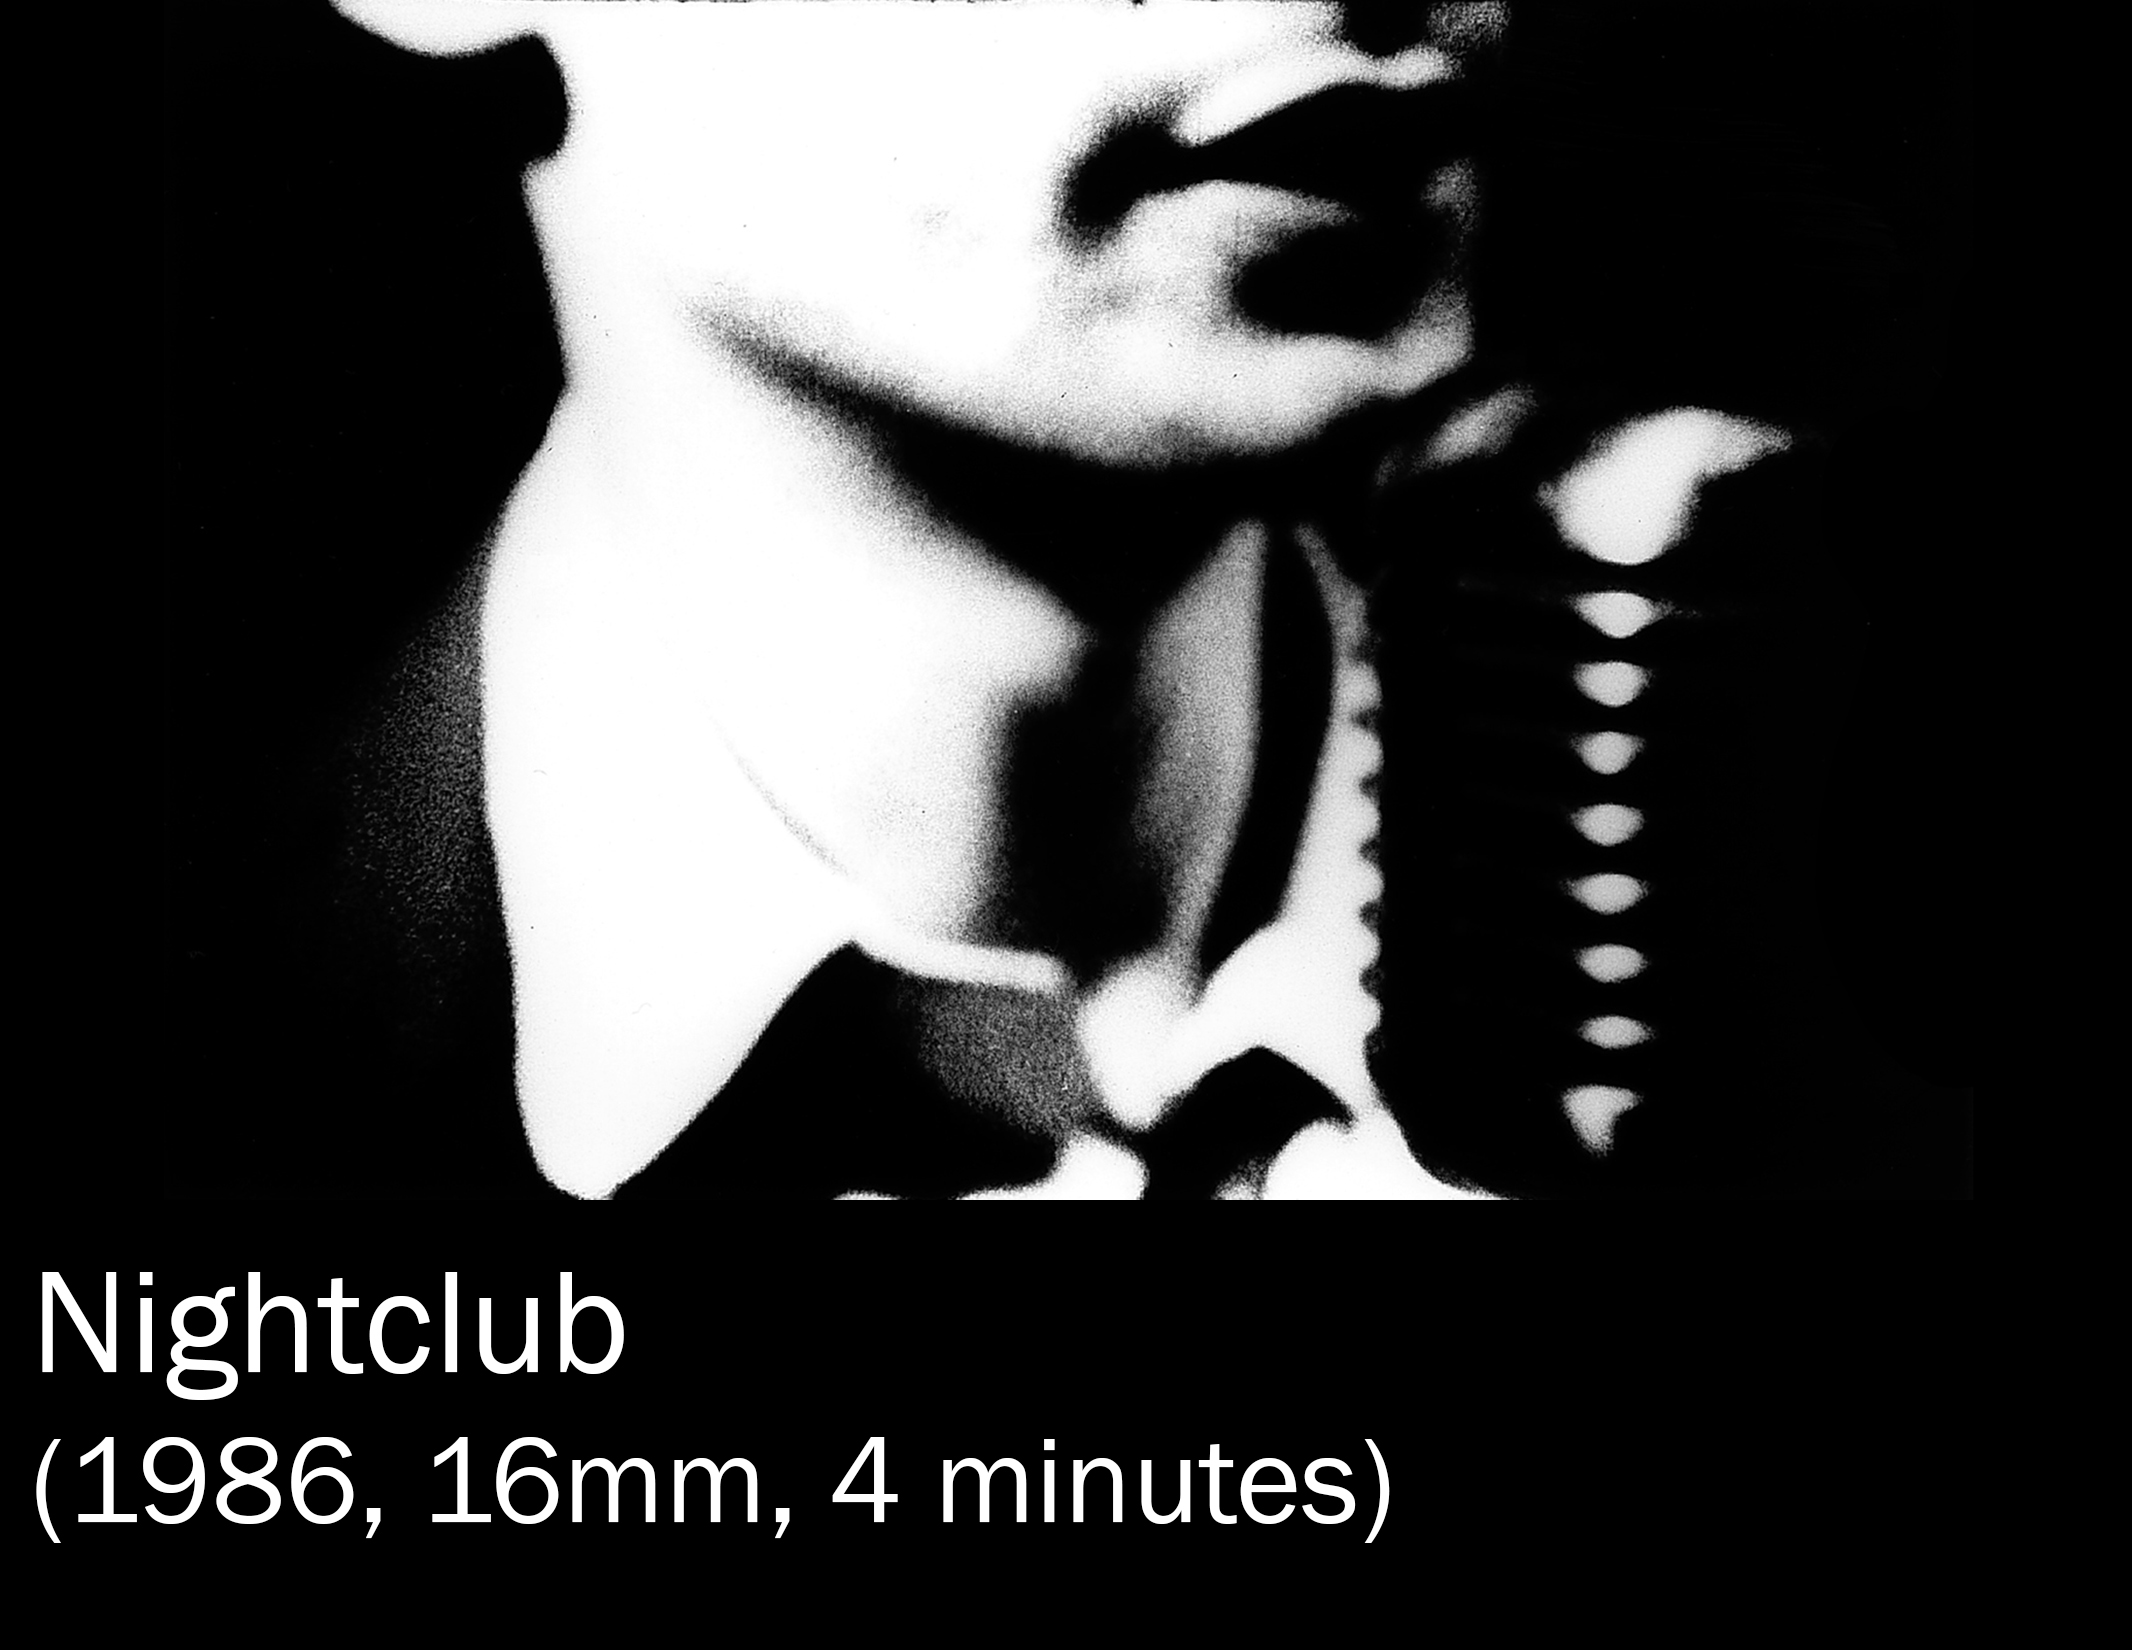 nightclub_prepped_for gallery_2.jpg